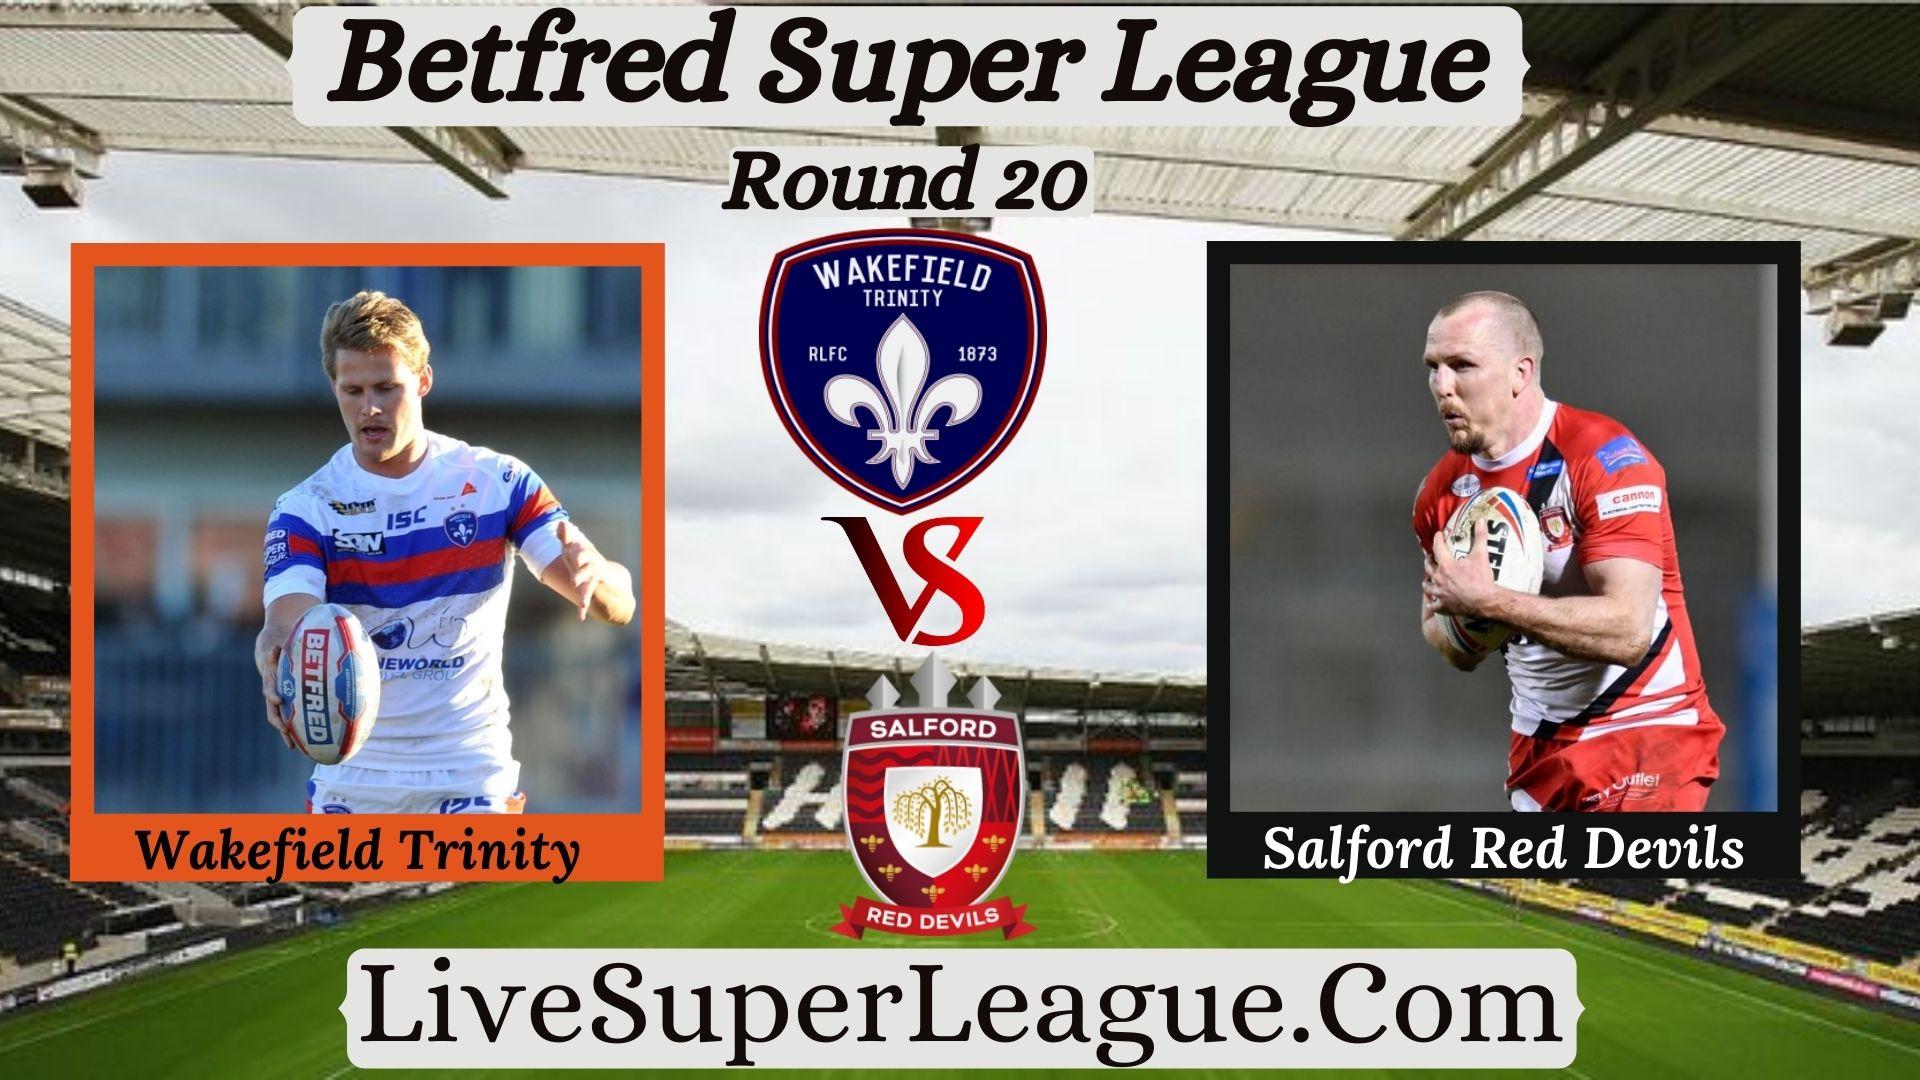 live-wakefield-trinity-vs-salford-red-devils-coverage